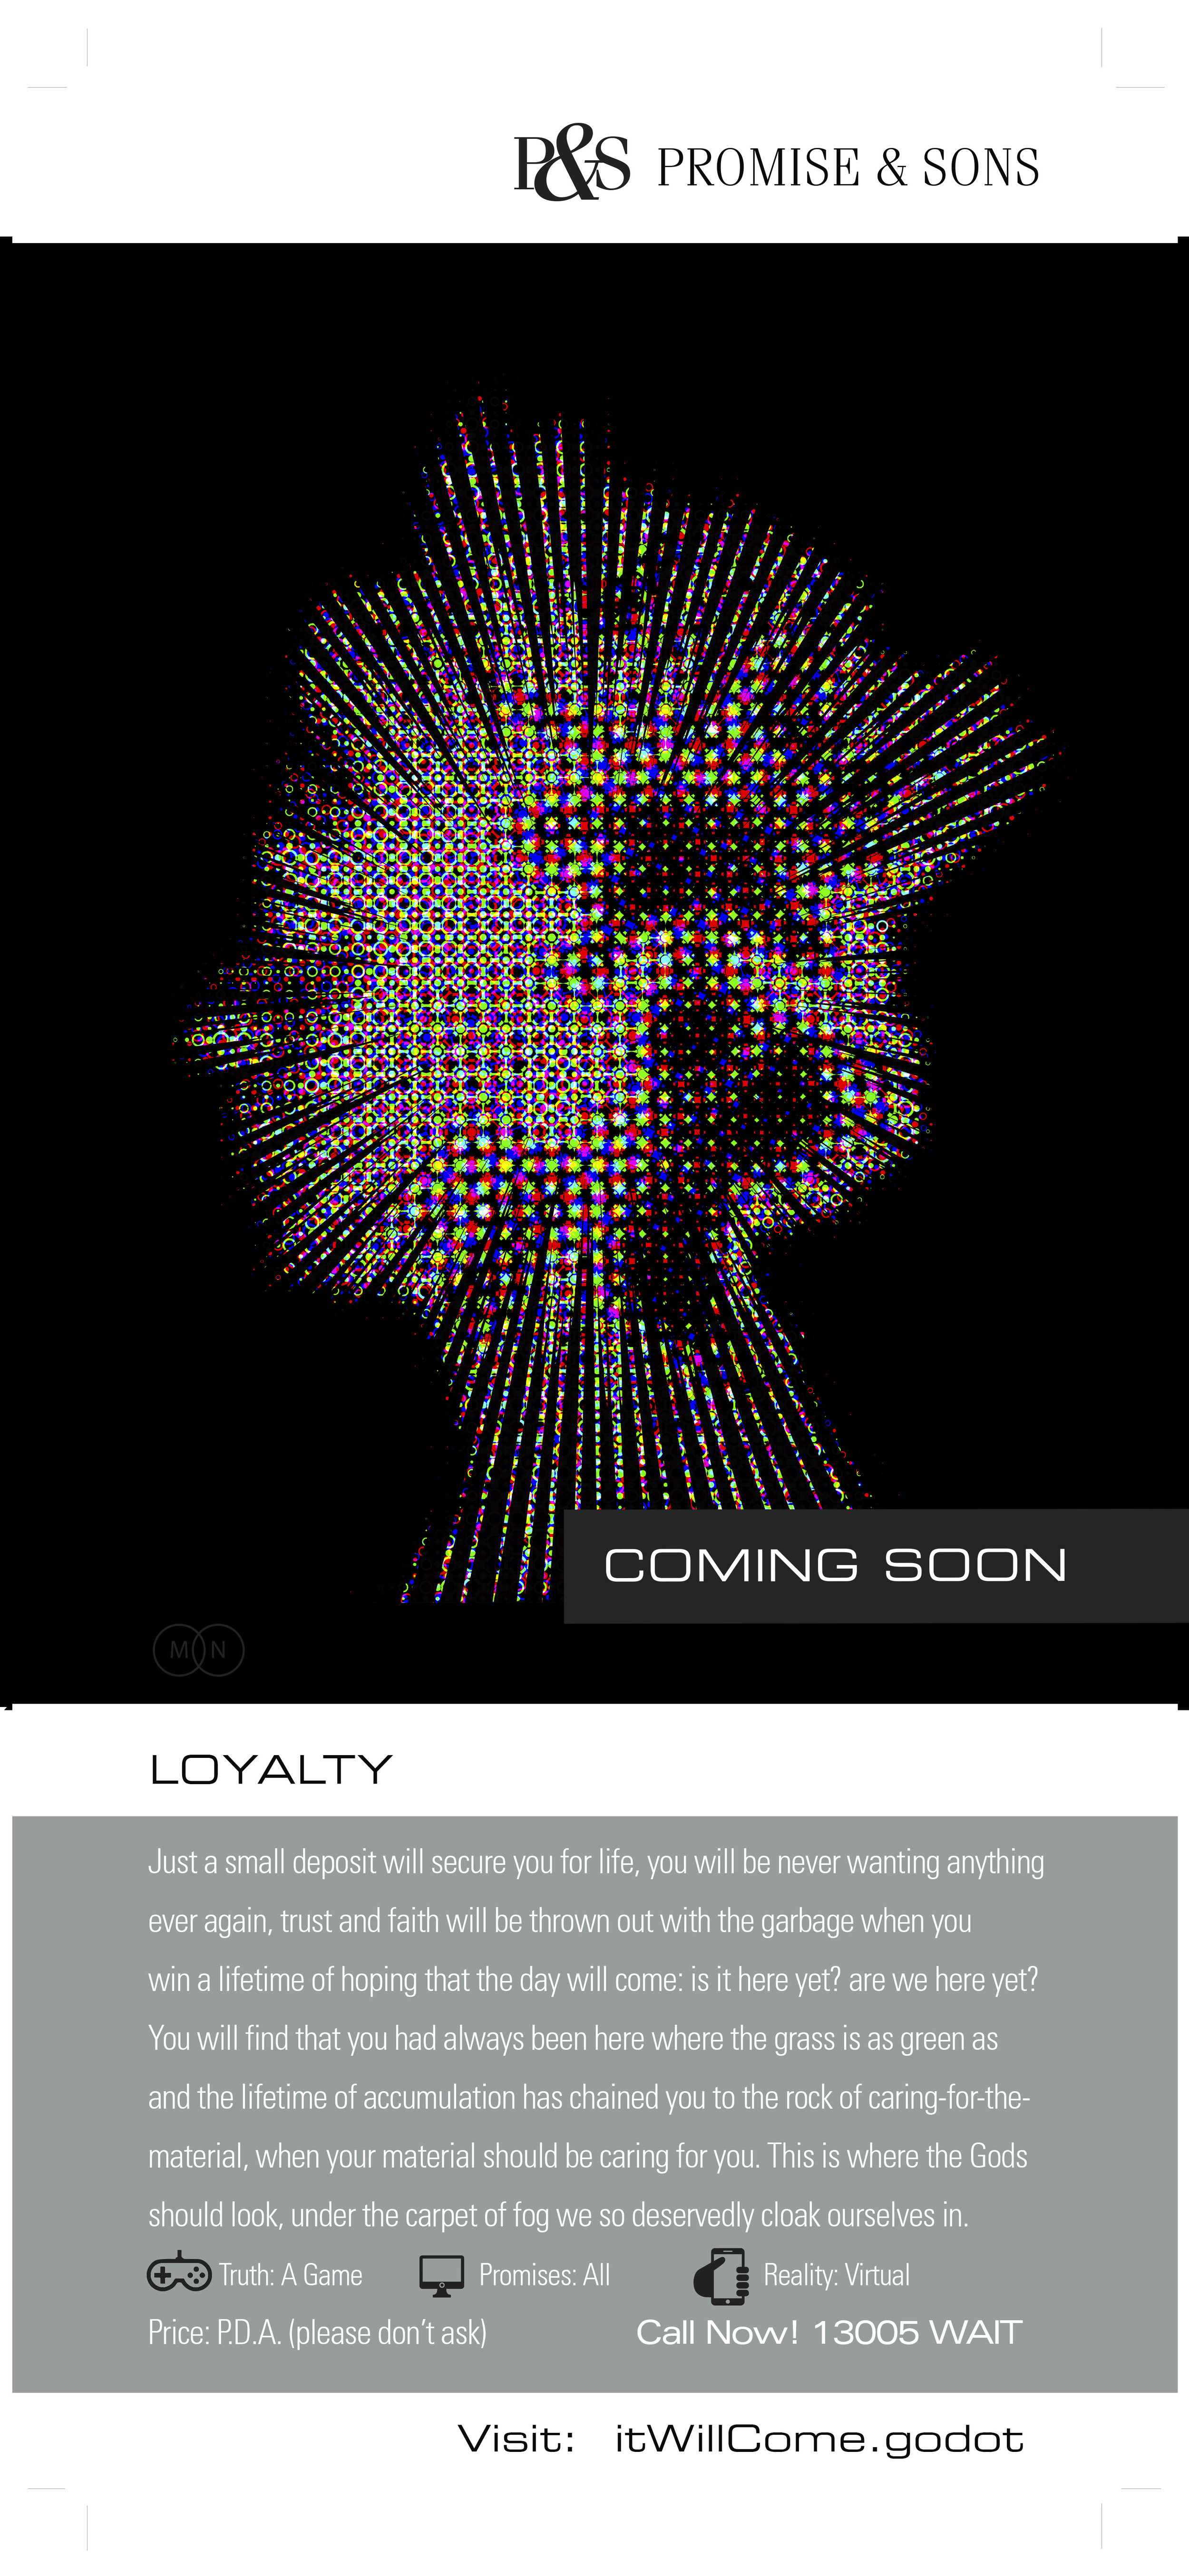 Slimline - Loyalty